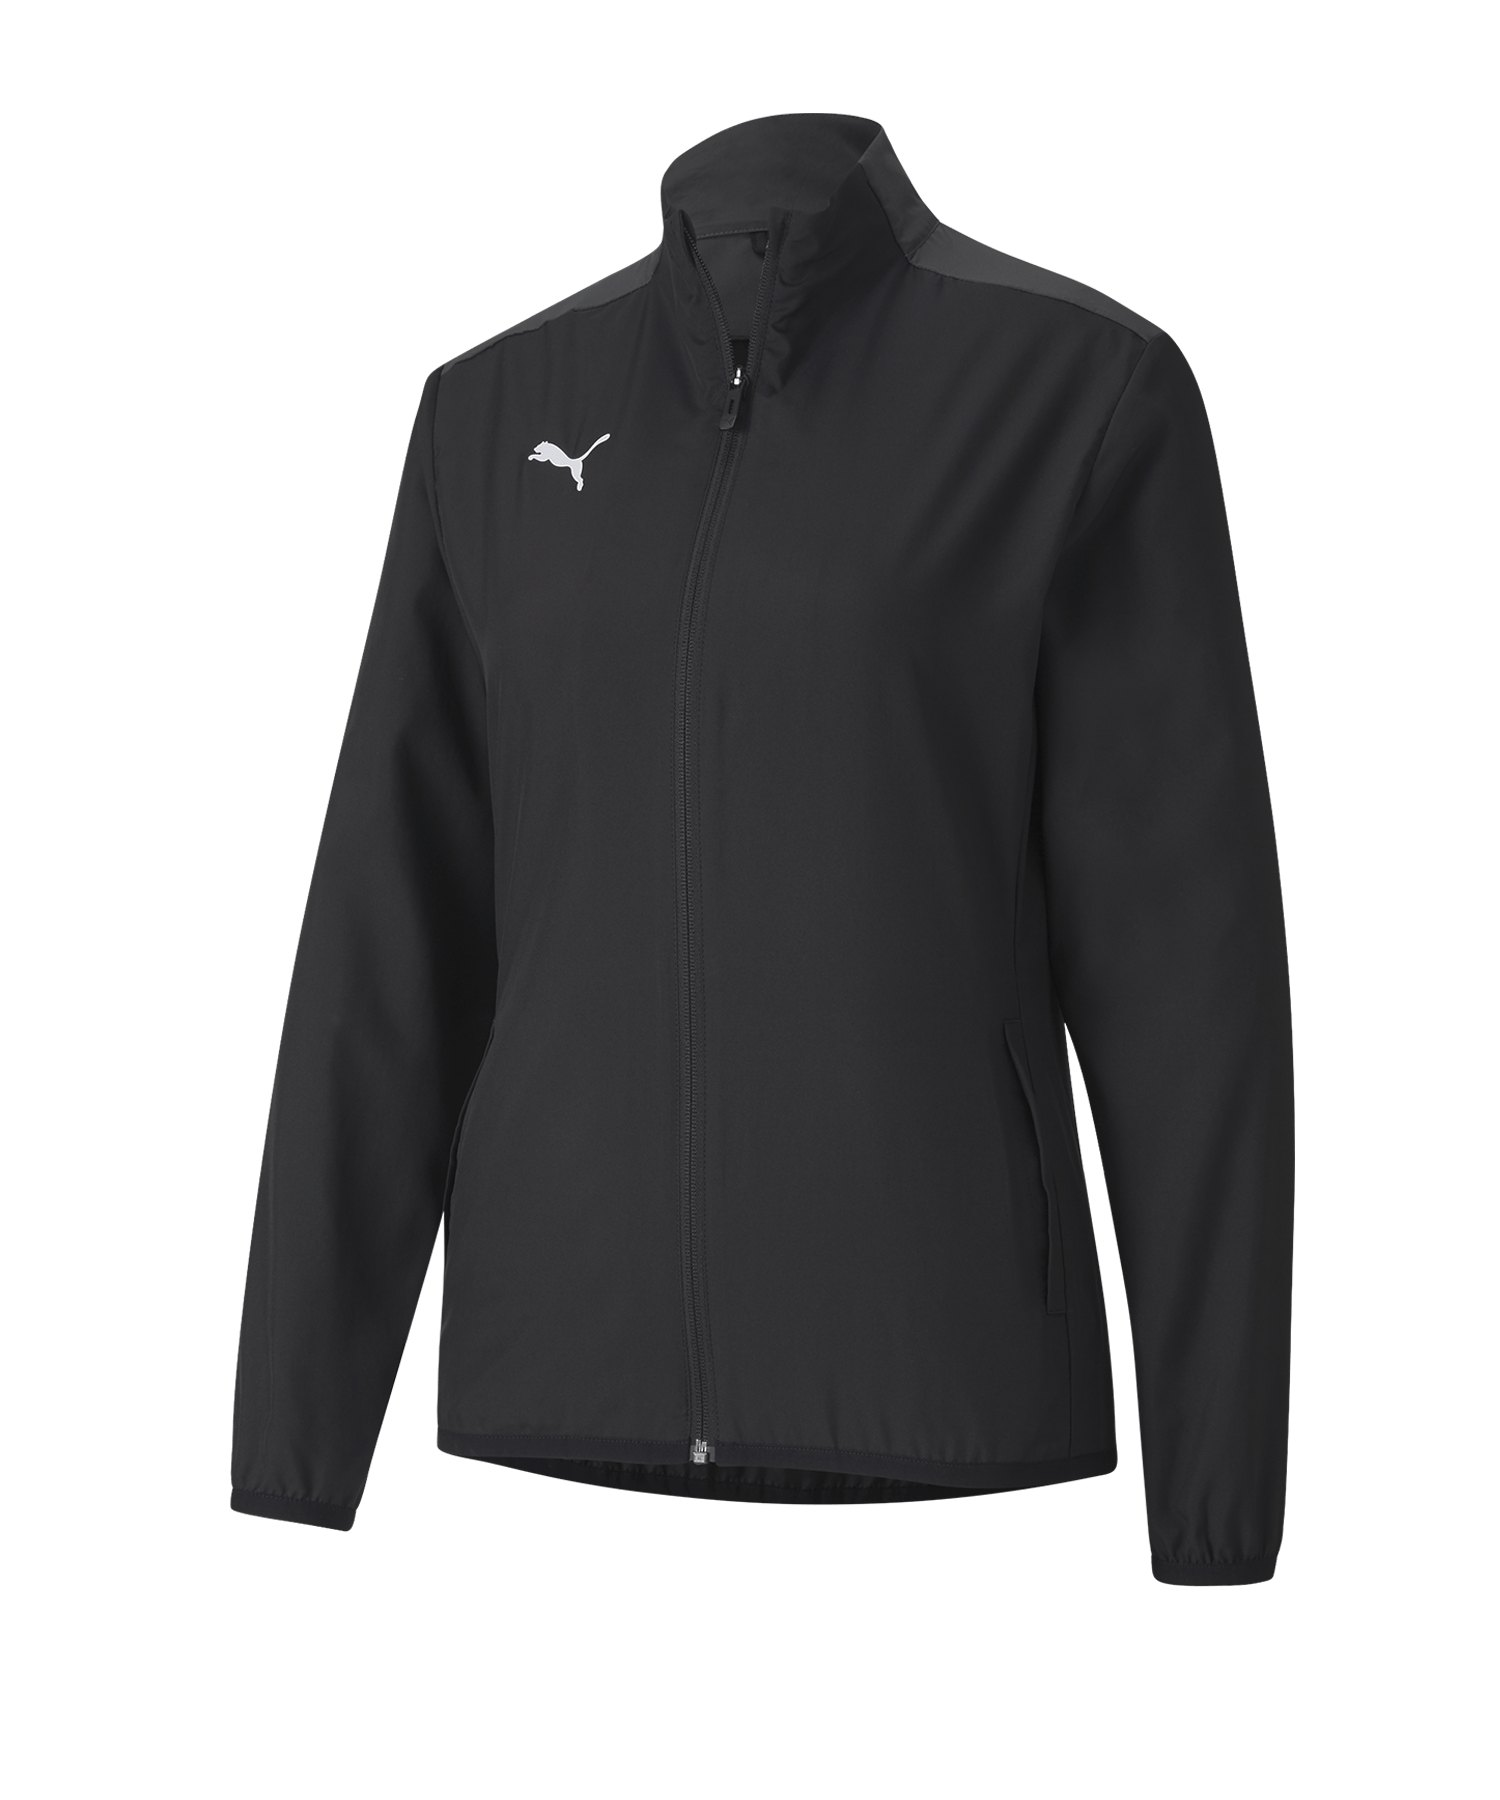 Nike Team Sideline Regenjacke ab 21,71 € im Preisvergleich kaufen